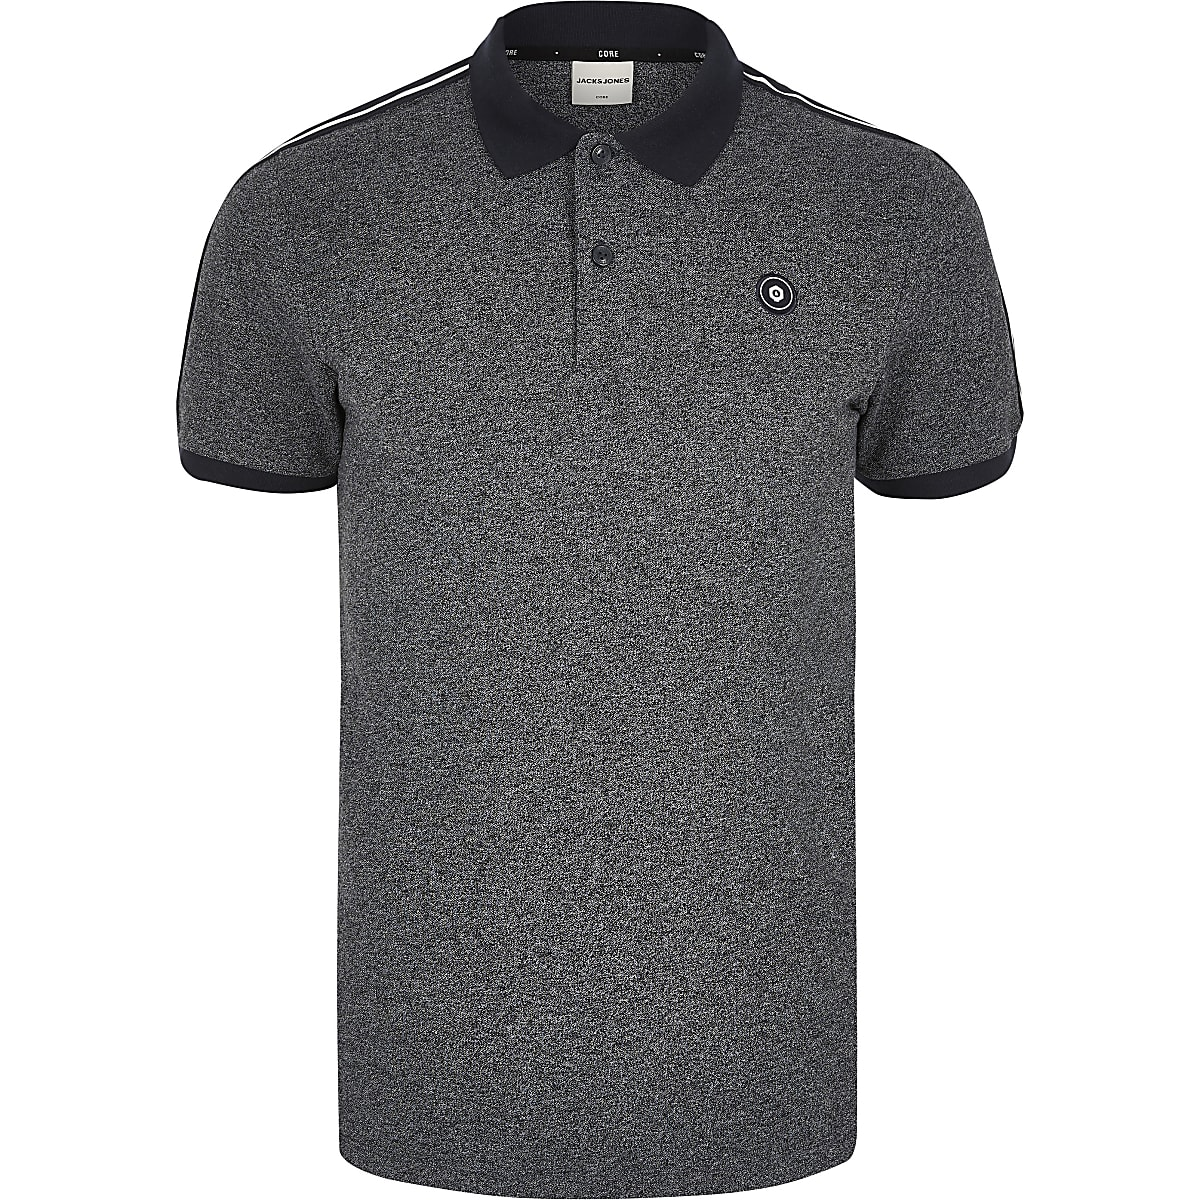 Jack and Jones grey short sleeve polo shirt